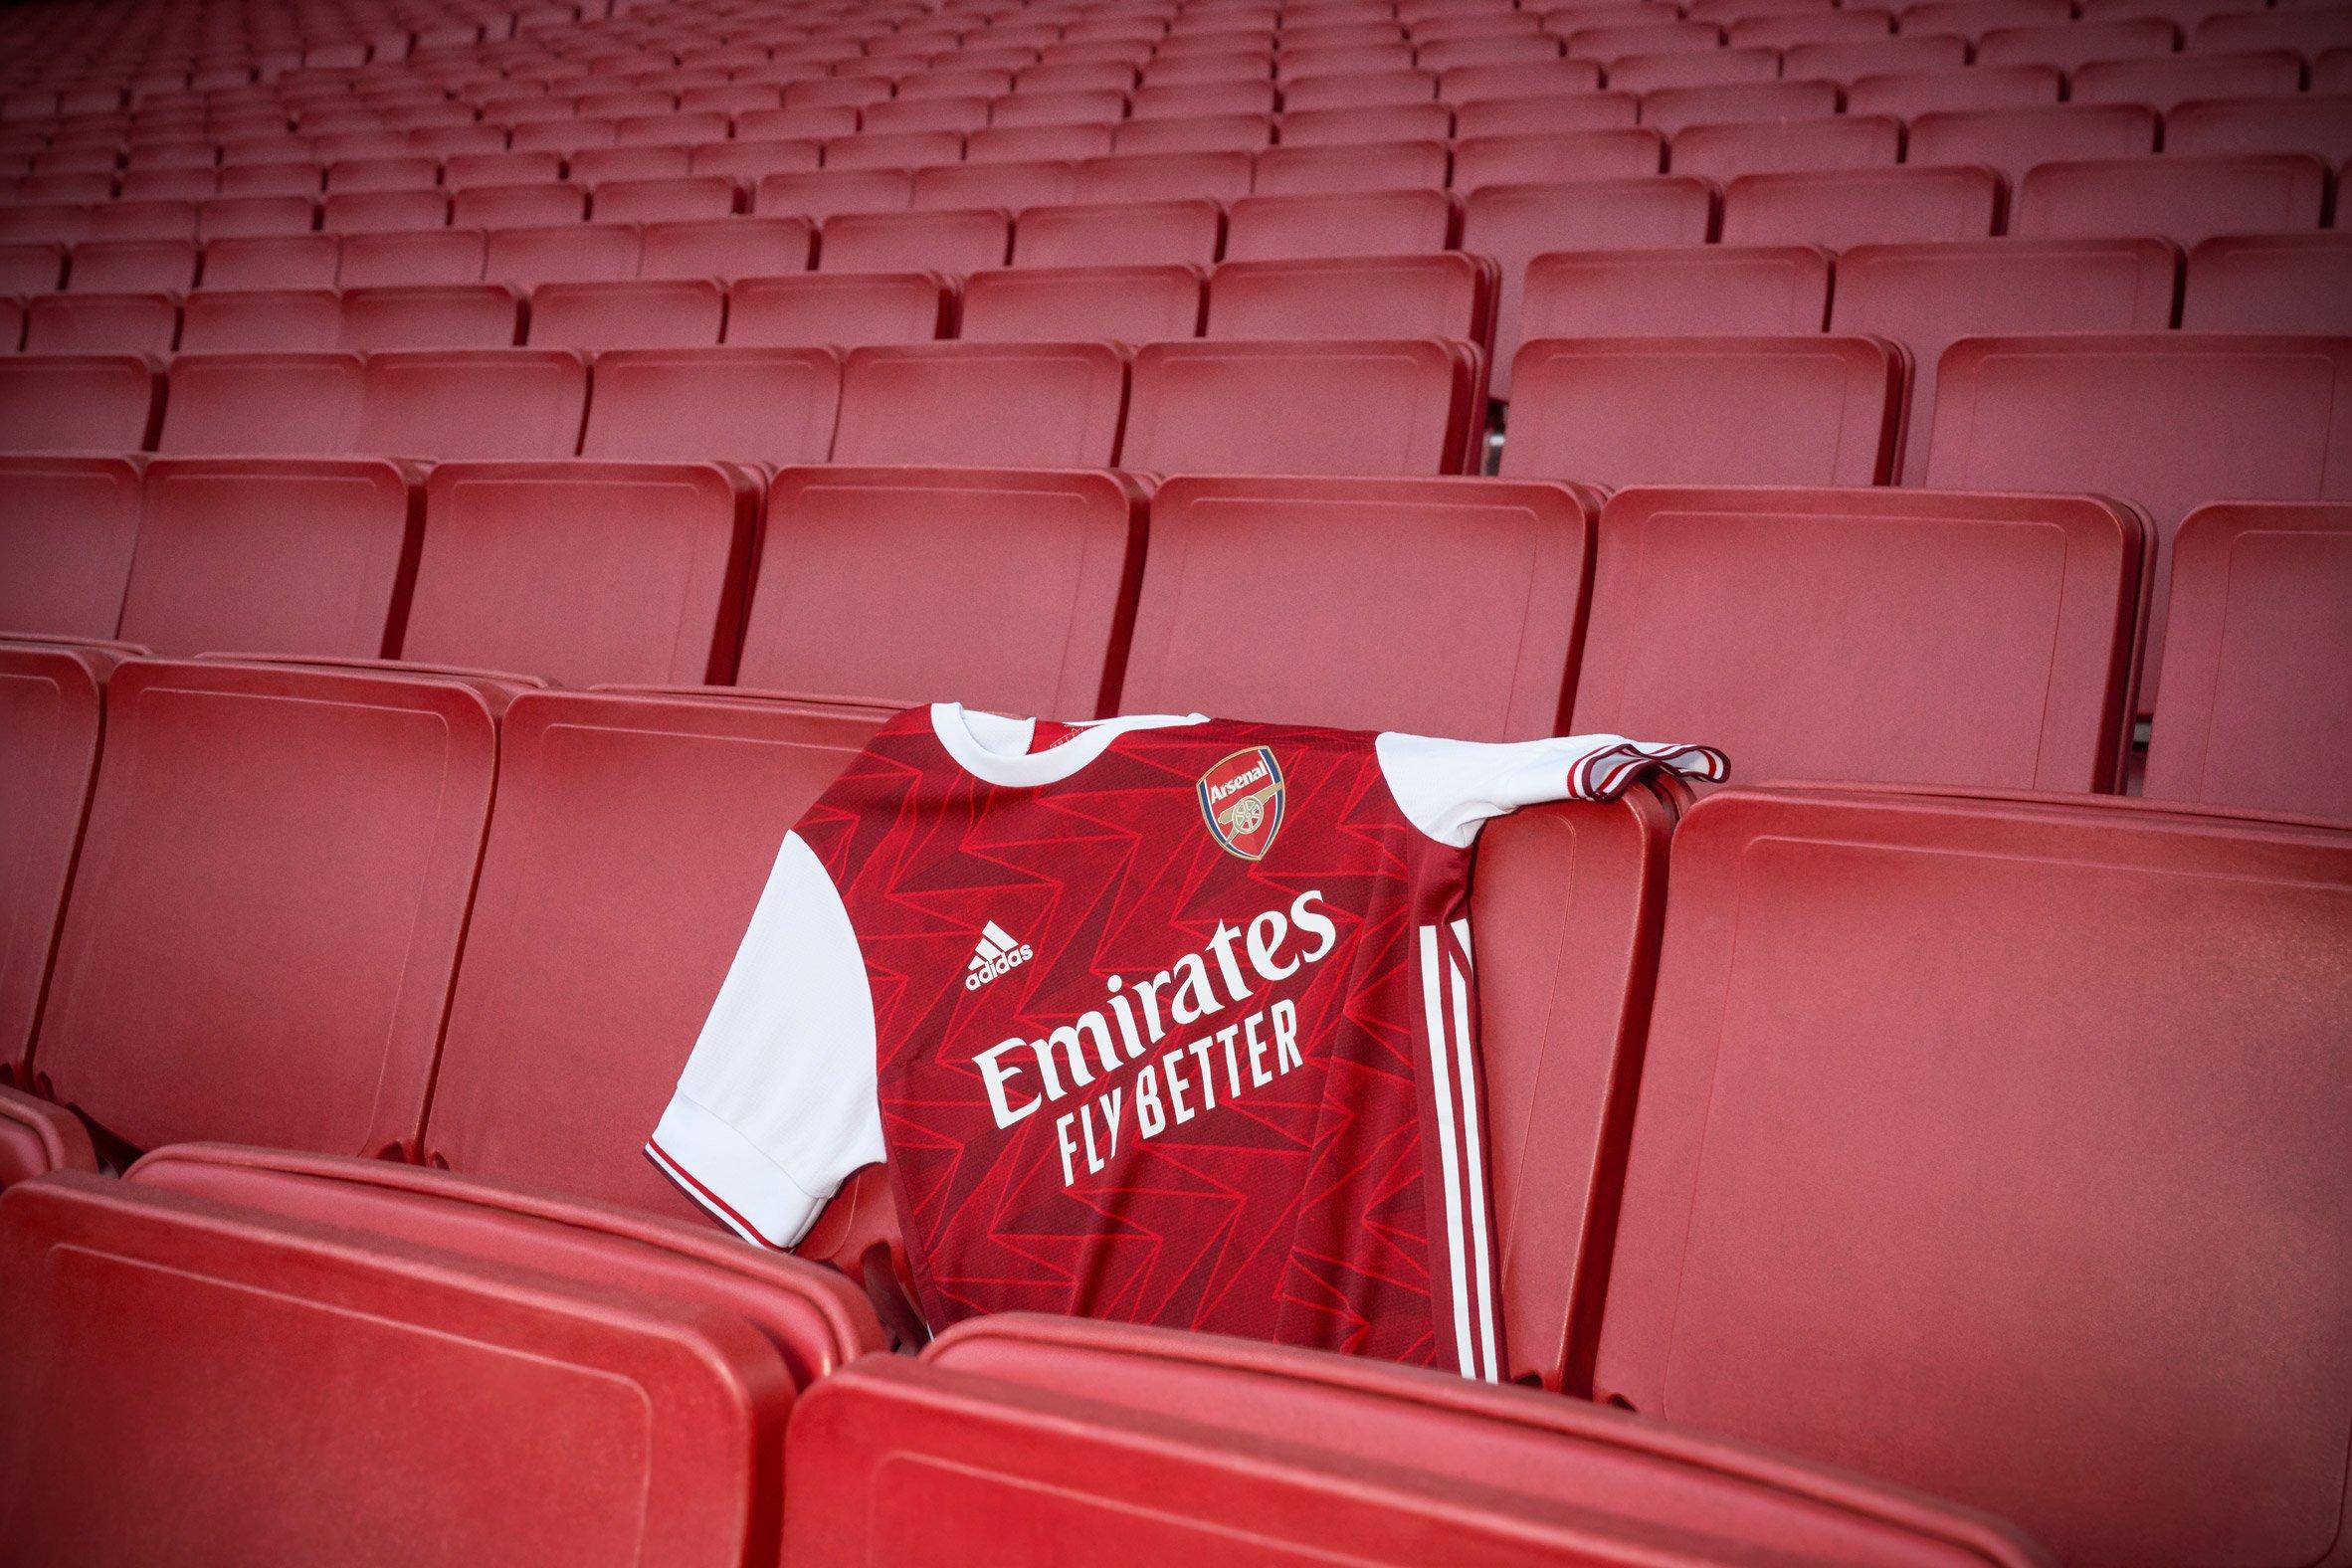 Arsenal 2020/2021 home shirt by Adidas